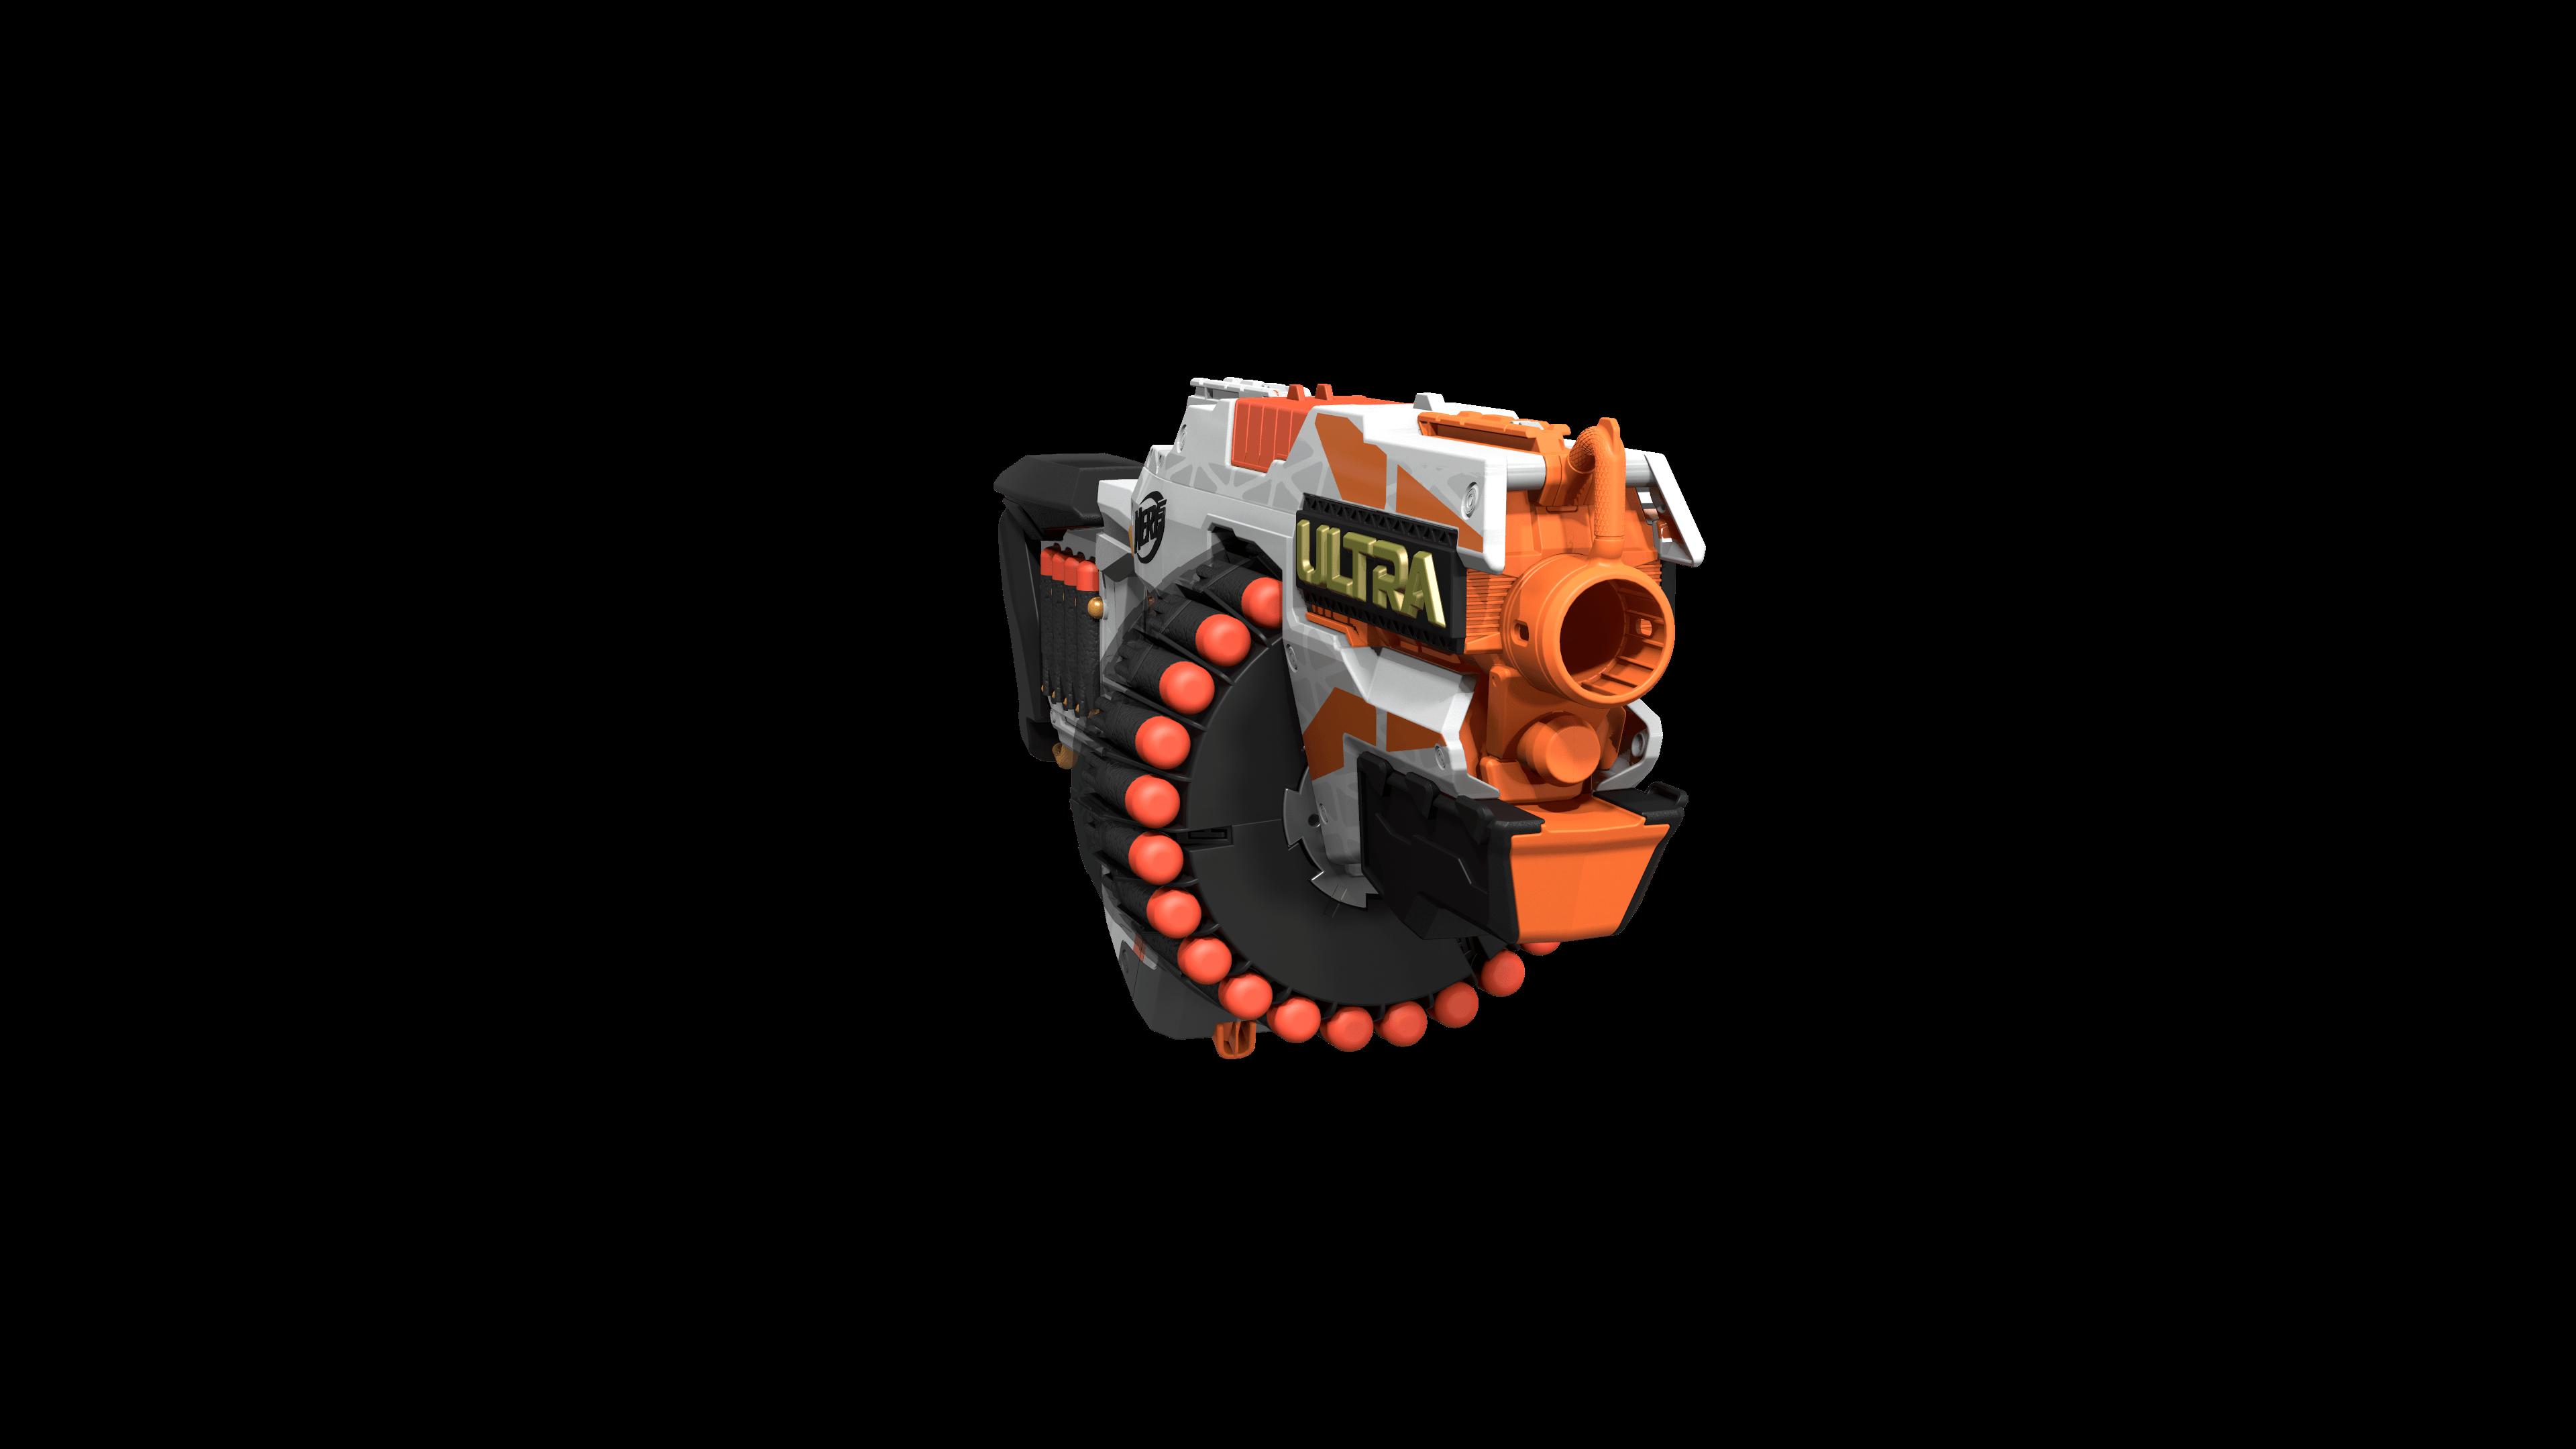 ultra blaster img 98